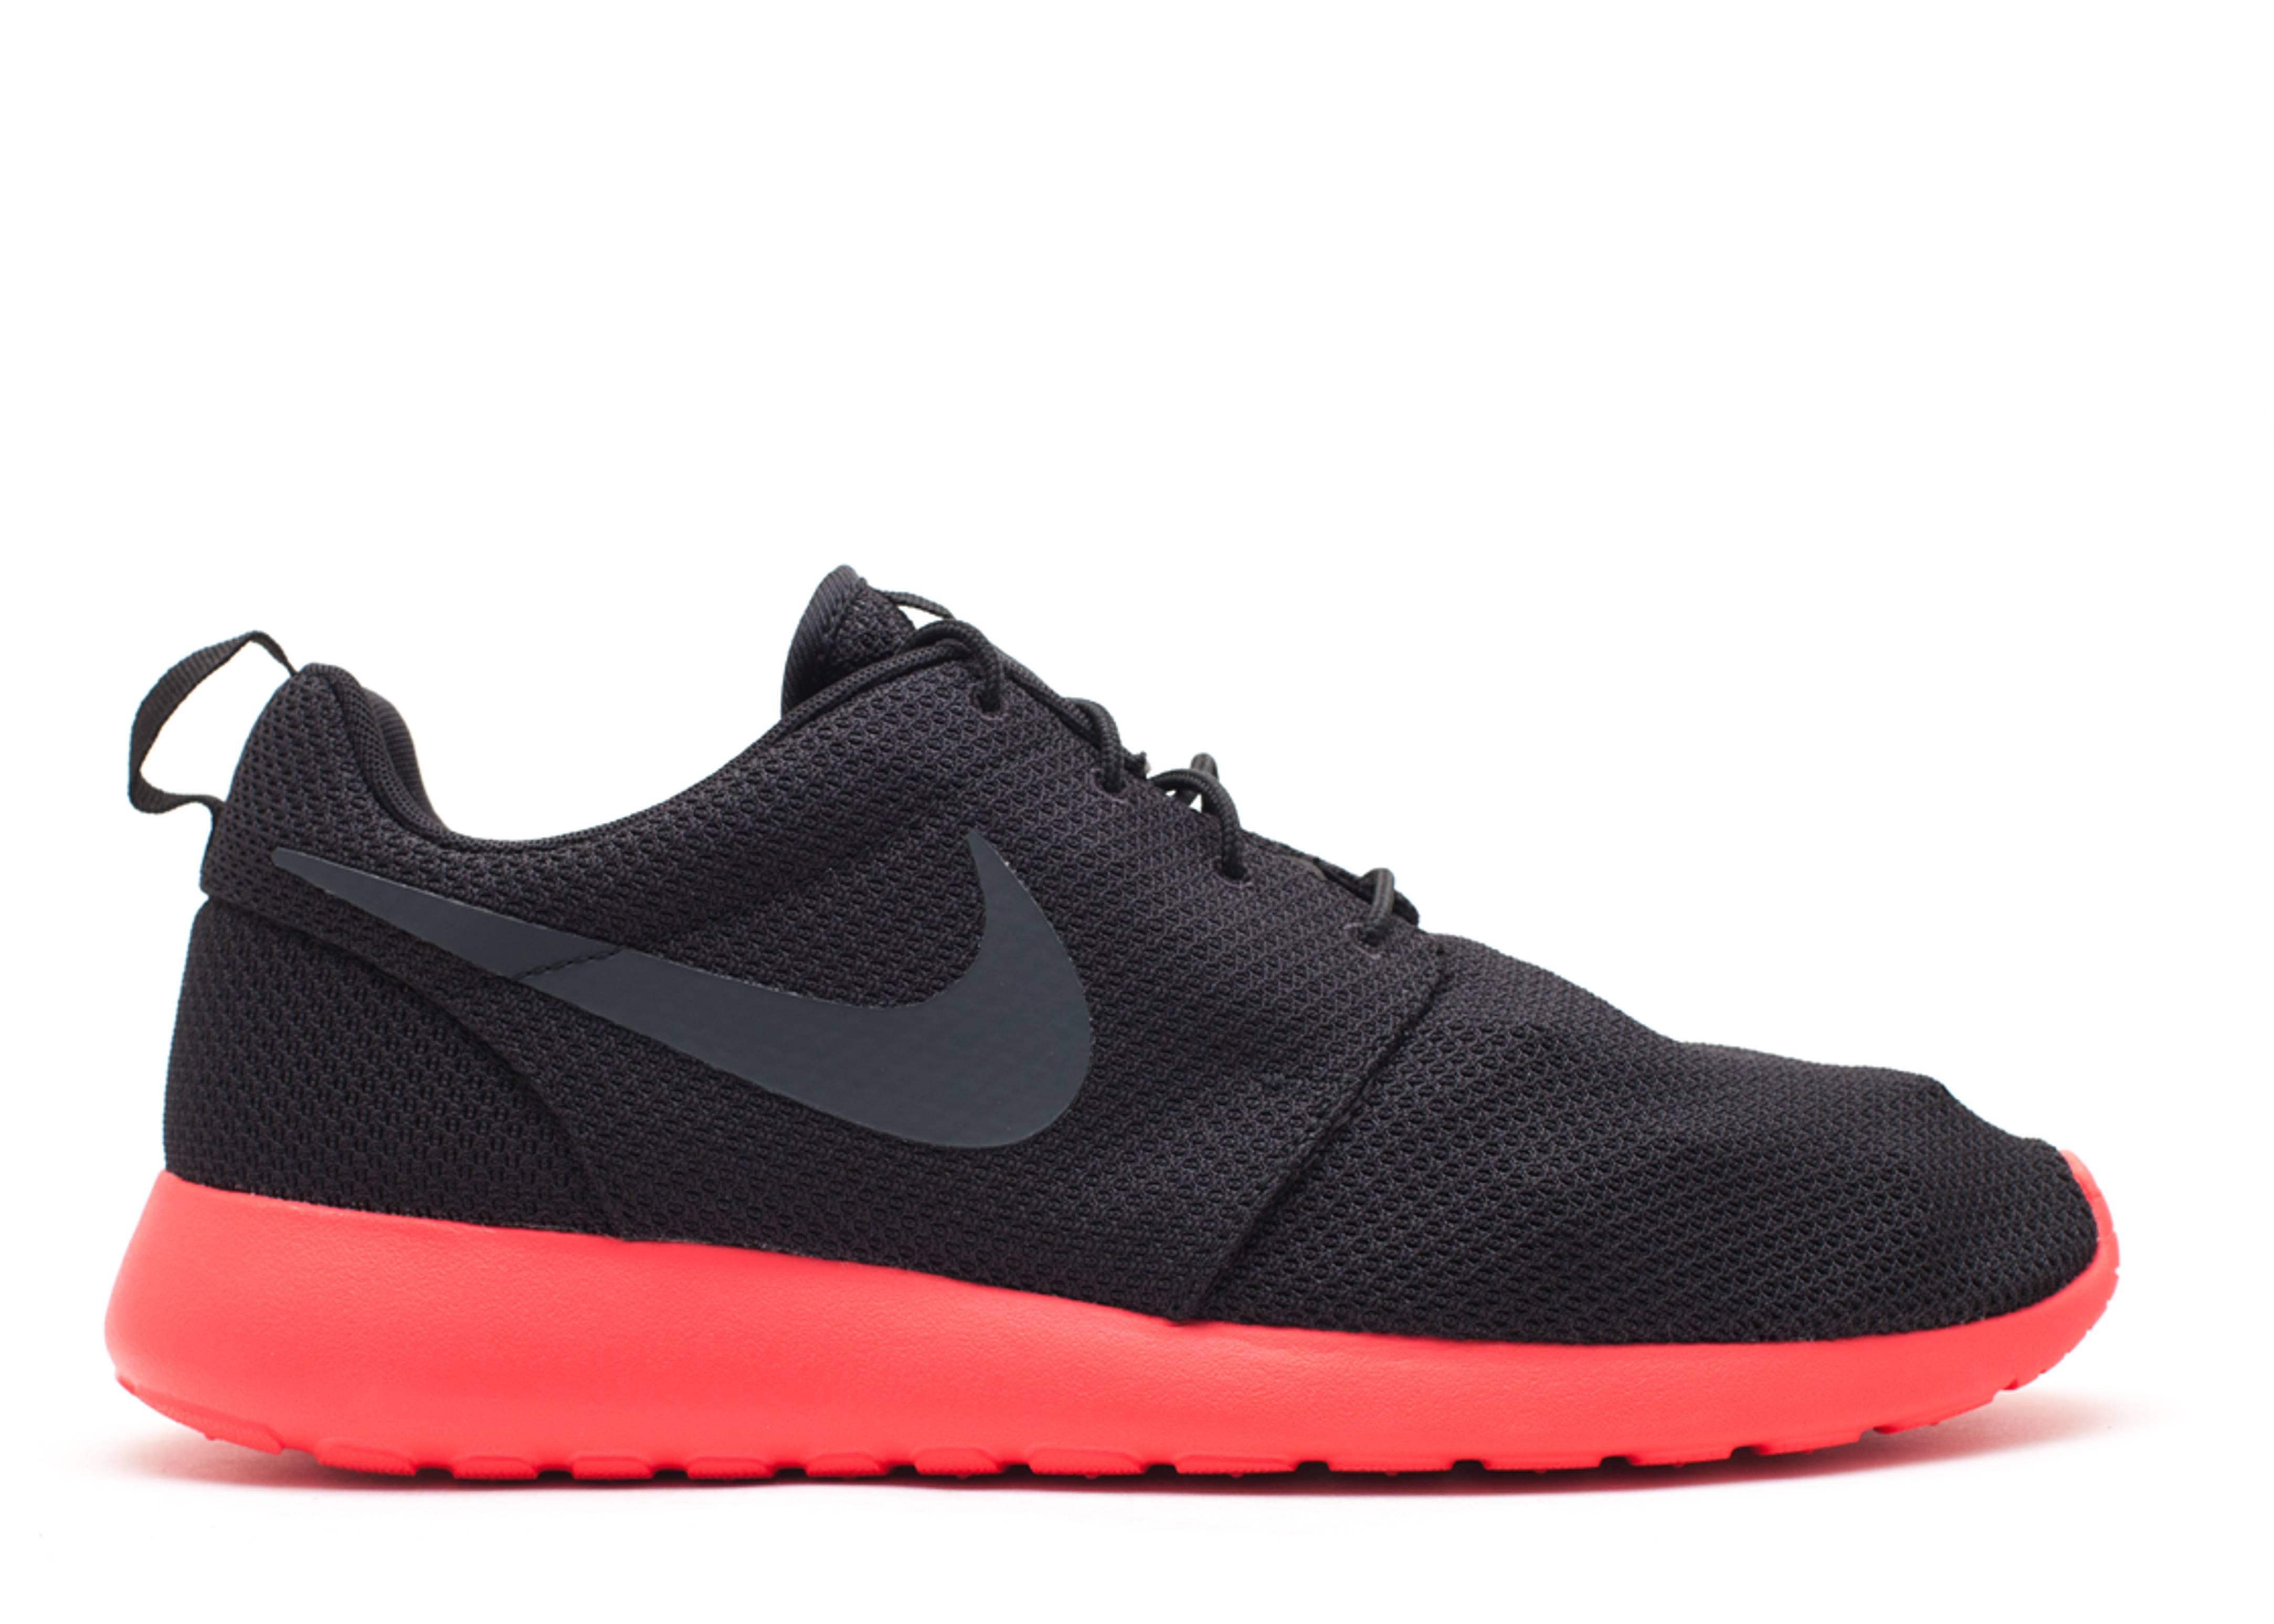 c896ff730e8 Rosherun - Nike - 511881 016 - black anthracite-siren red